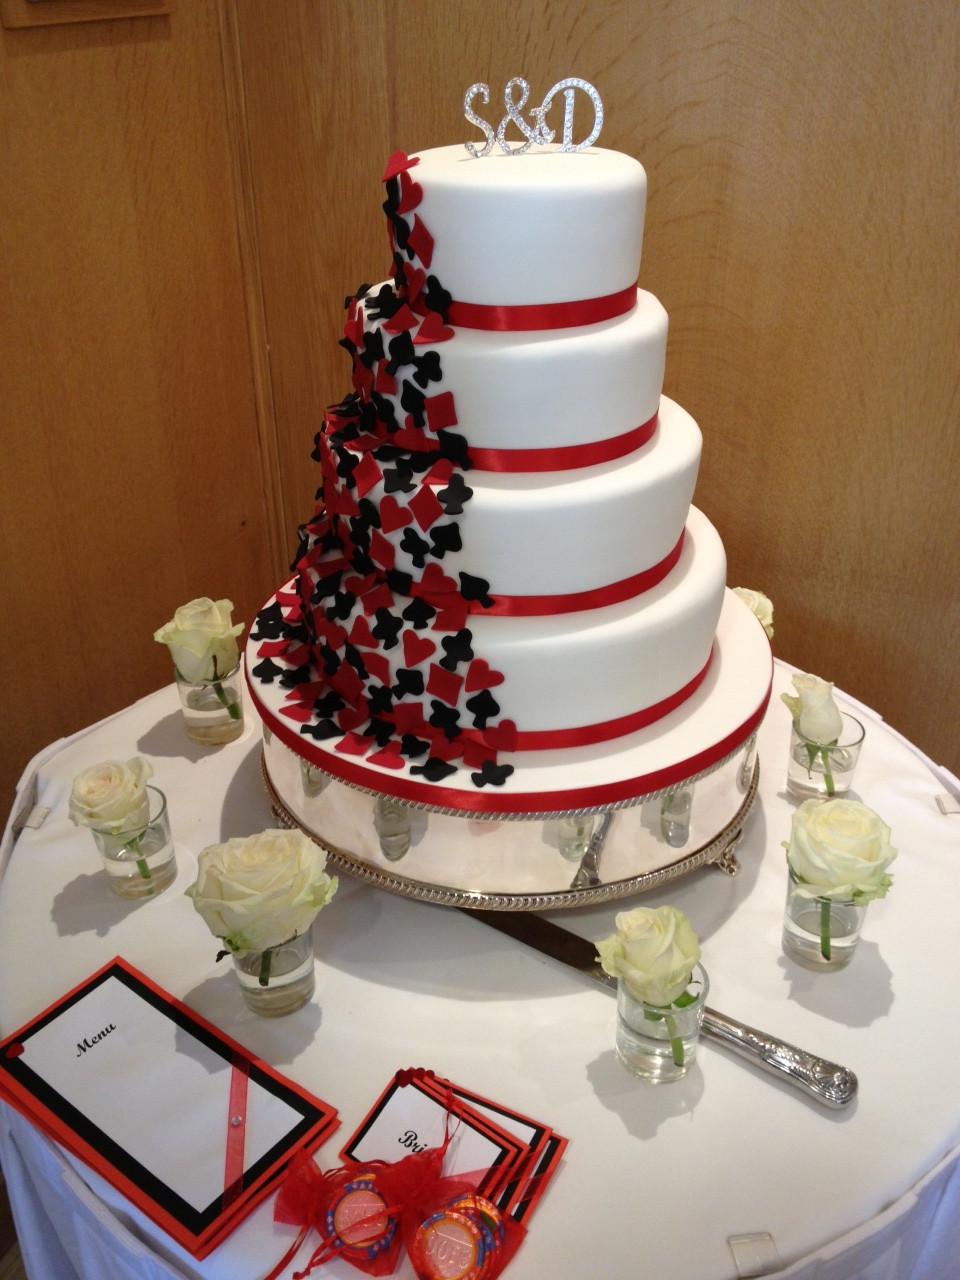 Wedding Cakes In Vegas  Wedding cakes in vegas idea in 2017